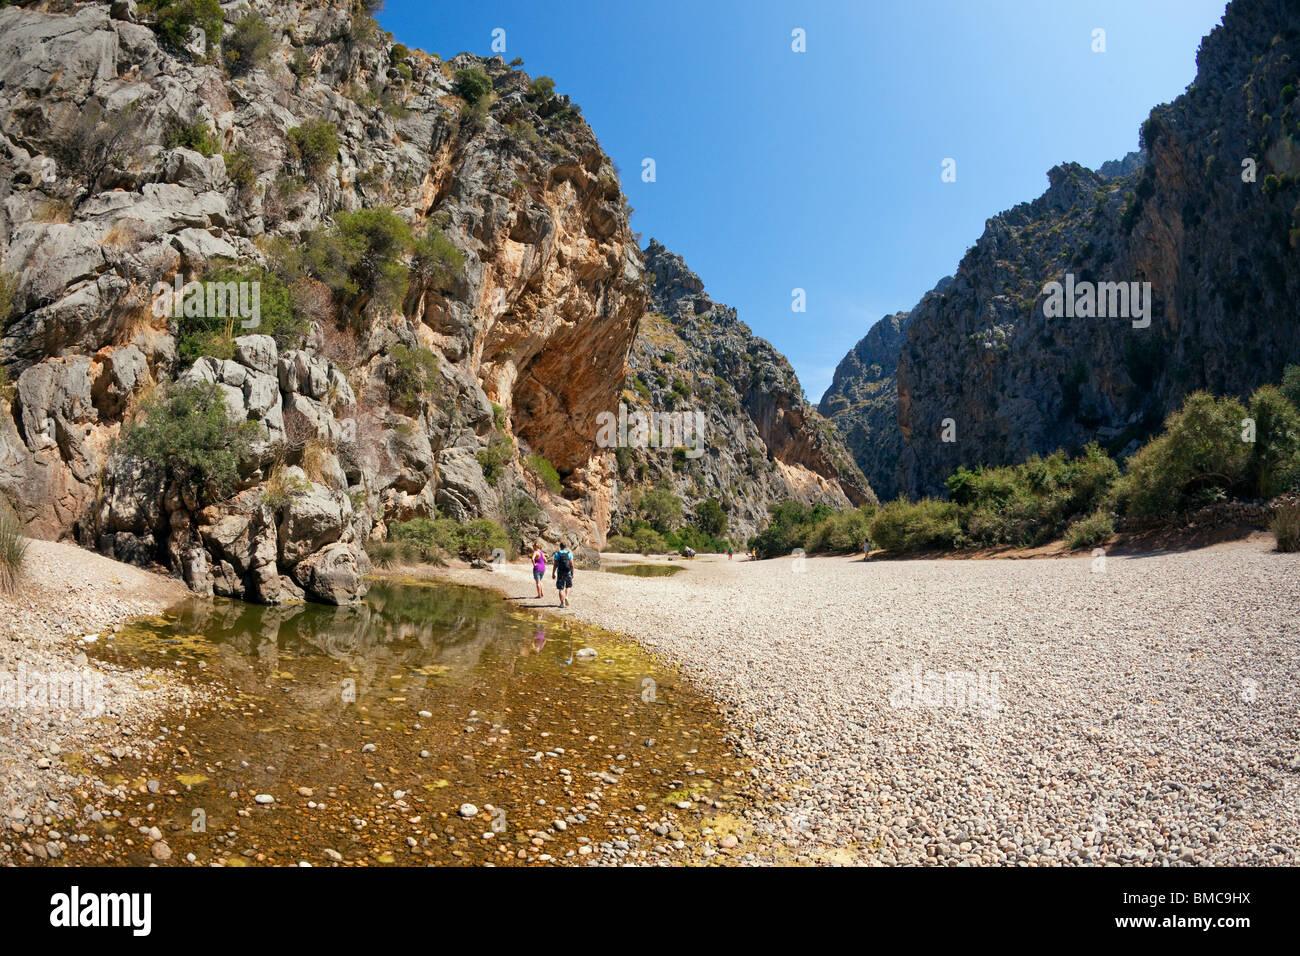 Torrent de Pareis Gorge Sa Calobra northern Majorca Mallorca Balearic Islands Spain Europe EU - Stock Image